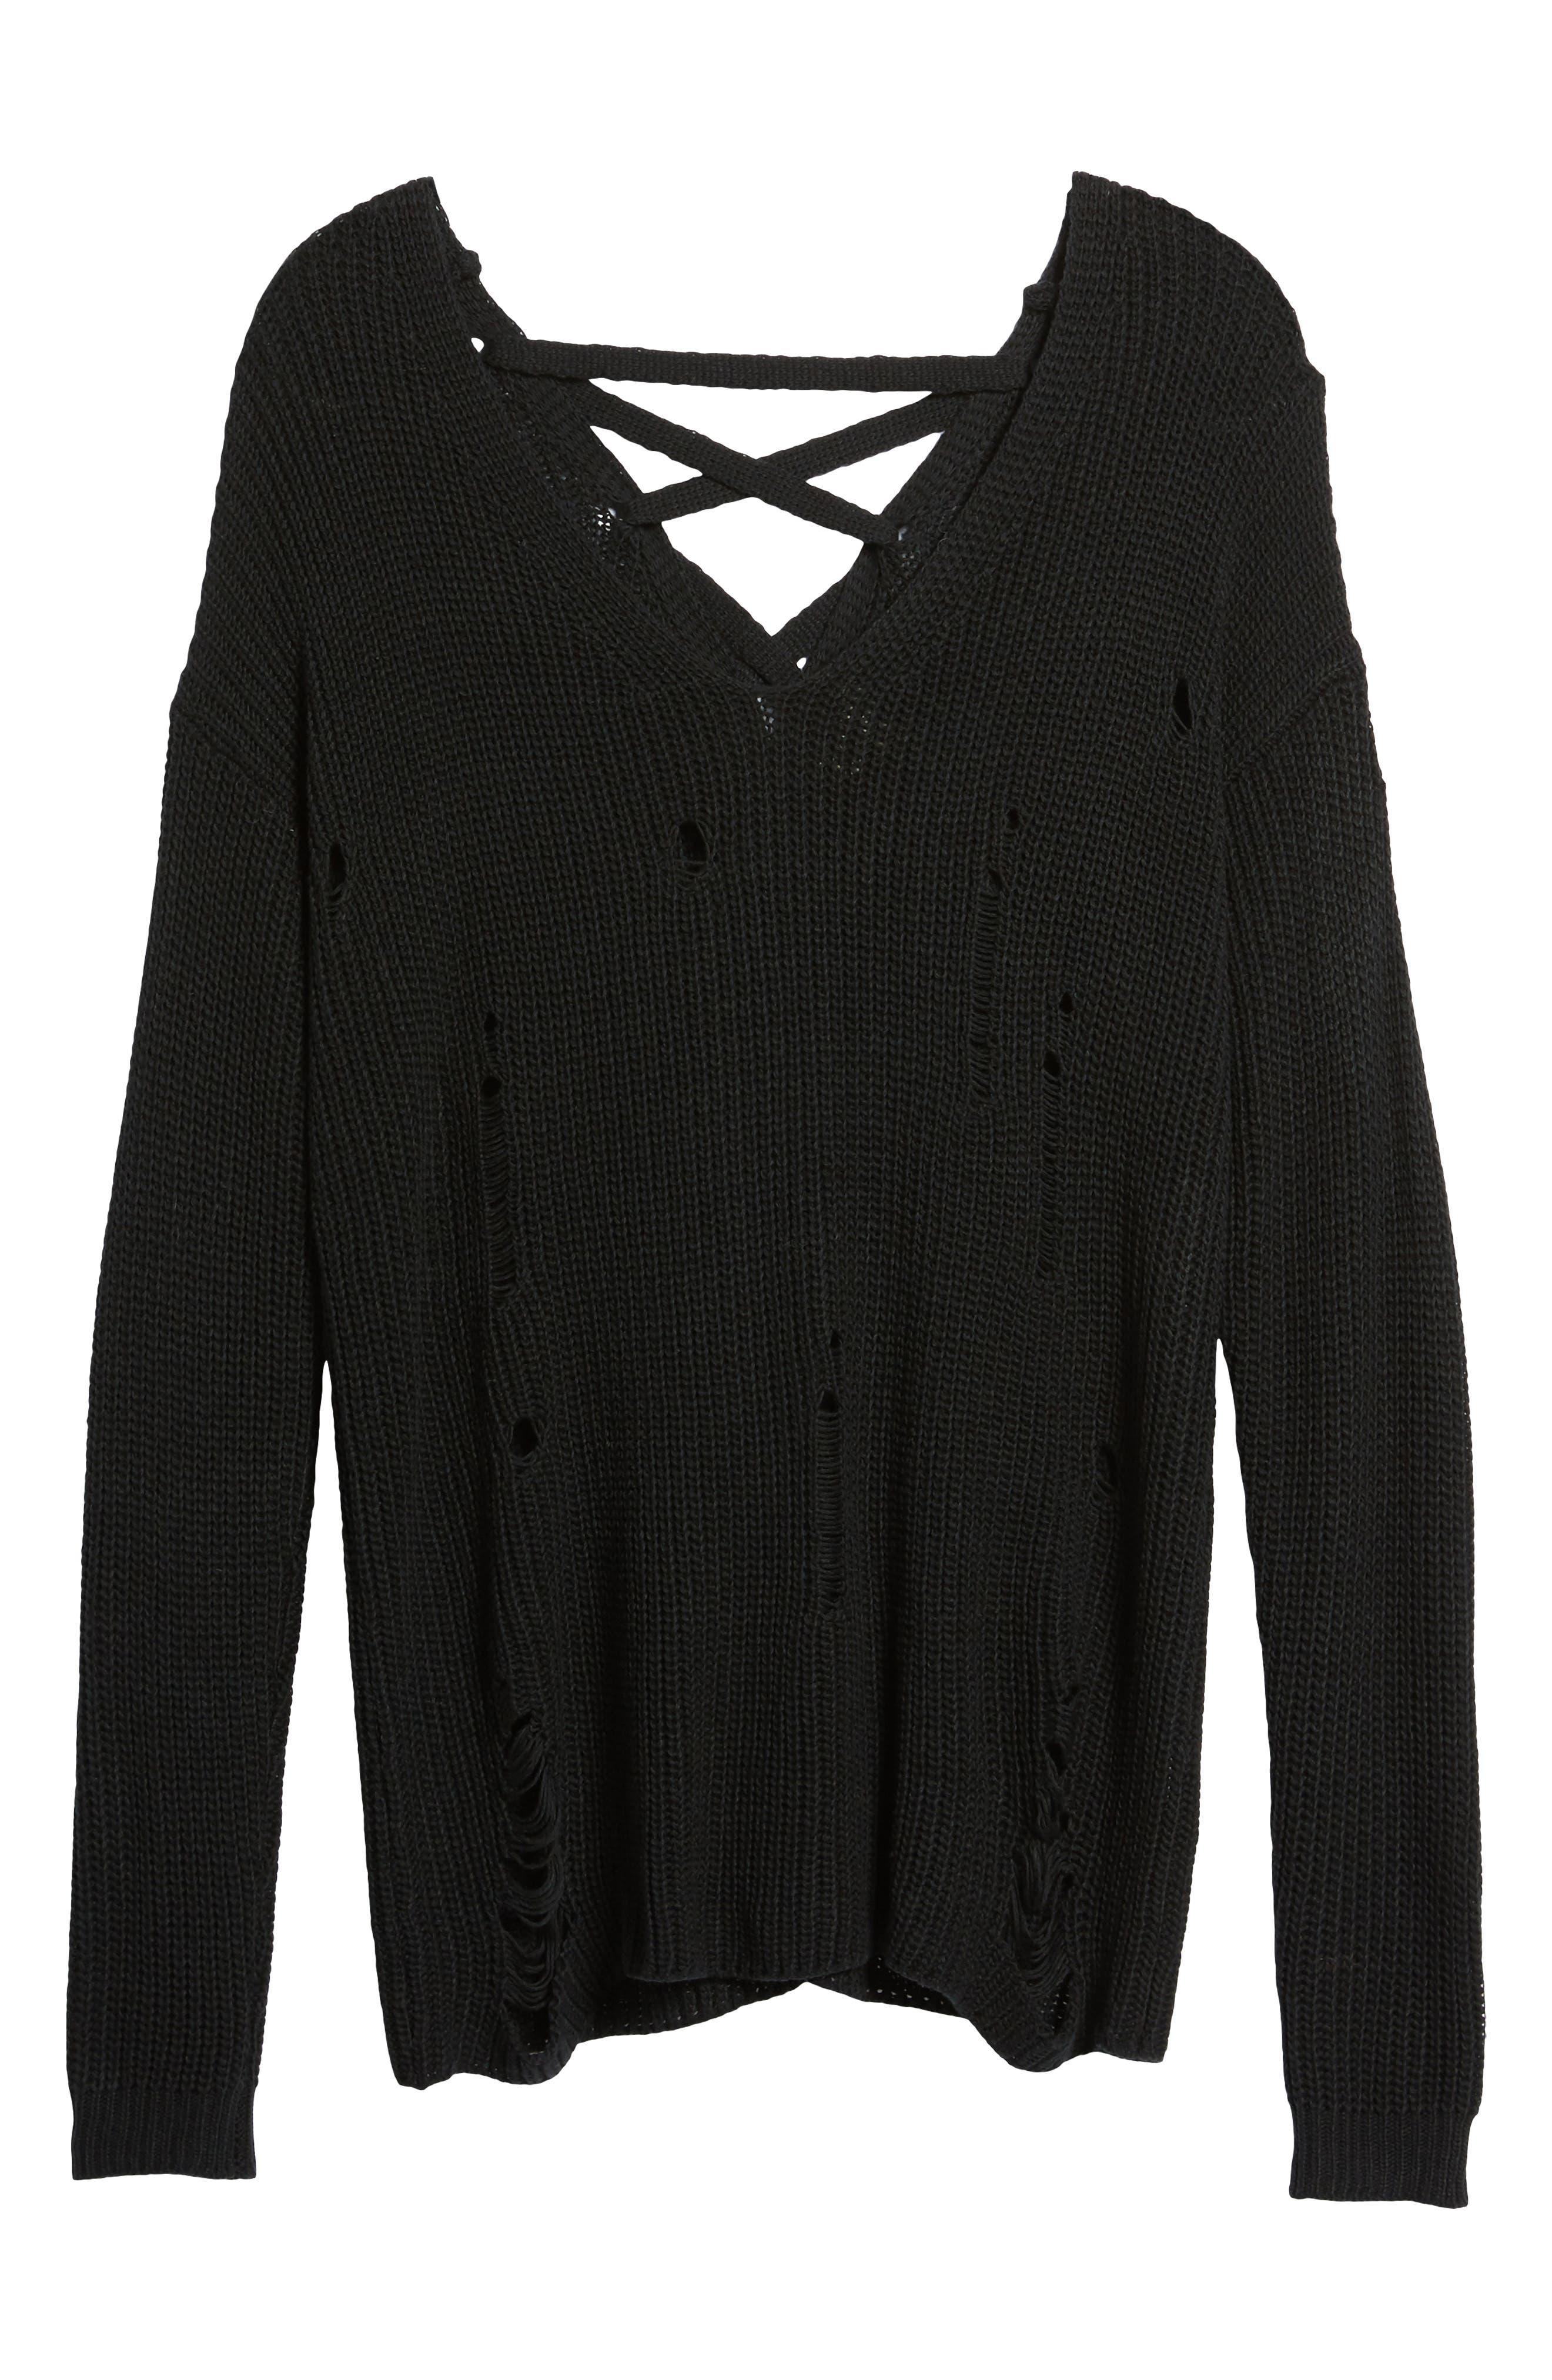 Cyndi Sweater,                             Alternate thumbnail 8, color,                             Black